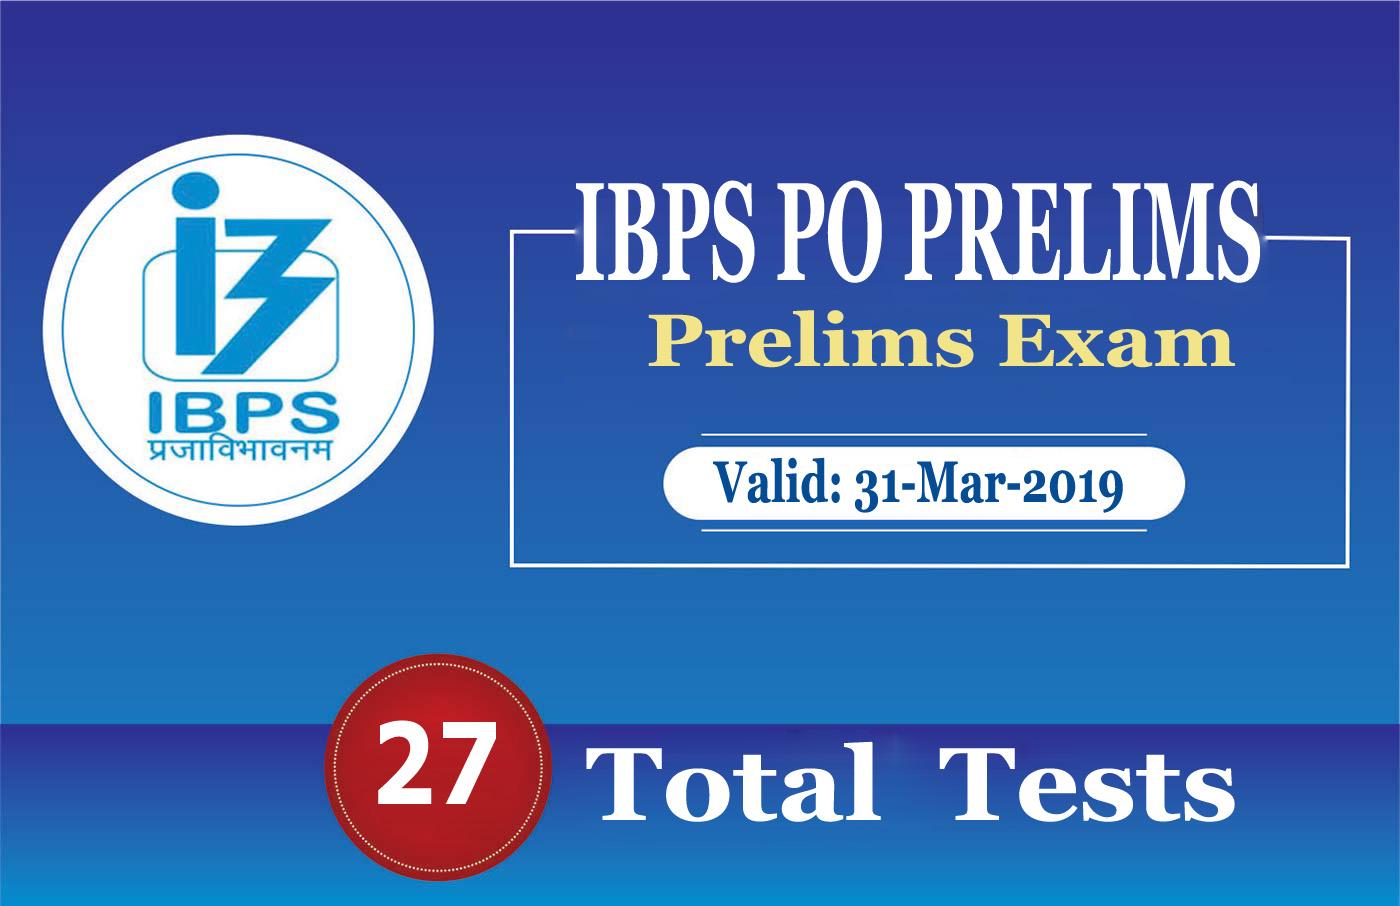 IBPS PO PRELIMS 2018